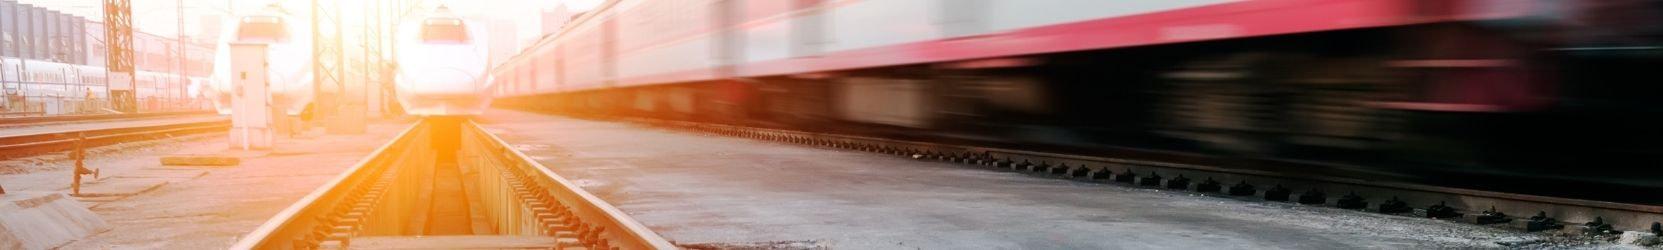 Vds training consultants interview prorail de beste trainee experience van nederland